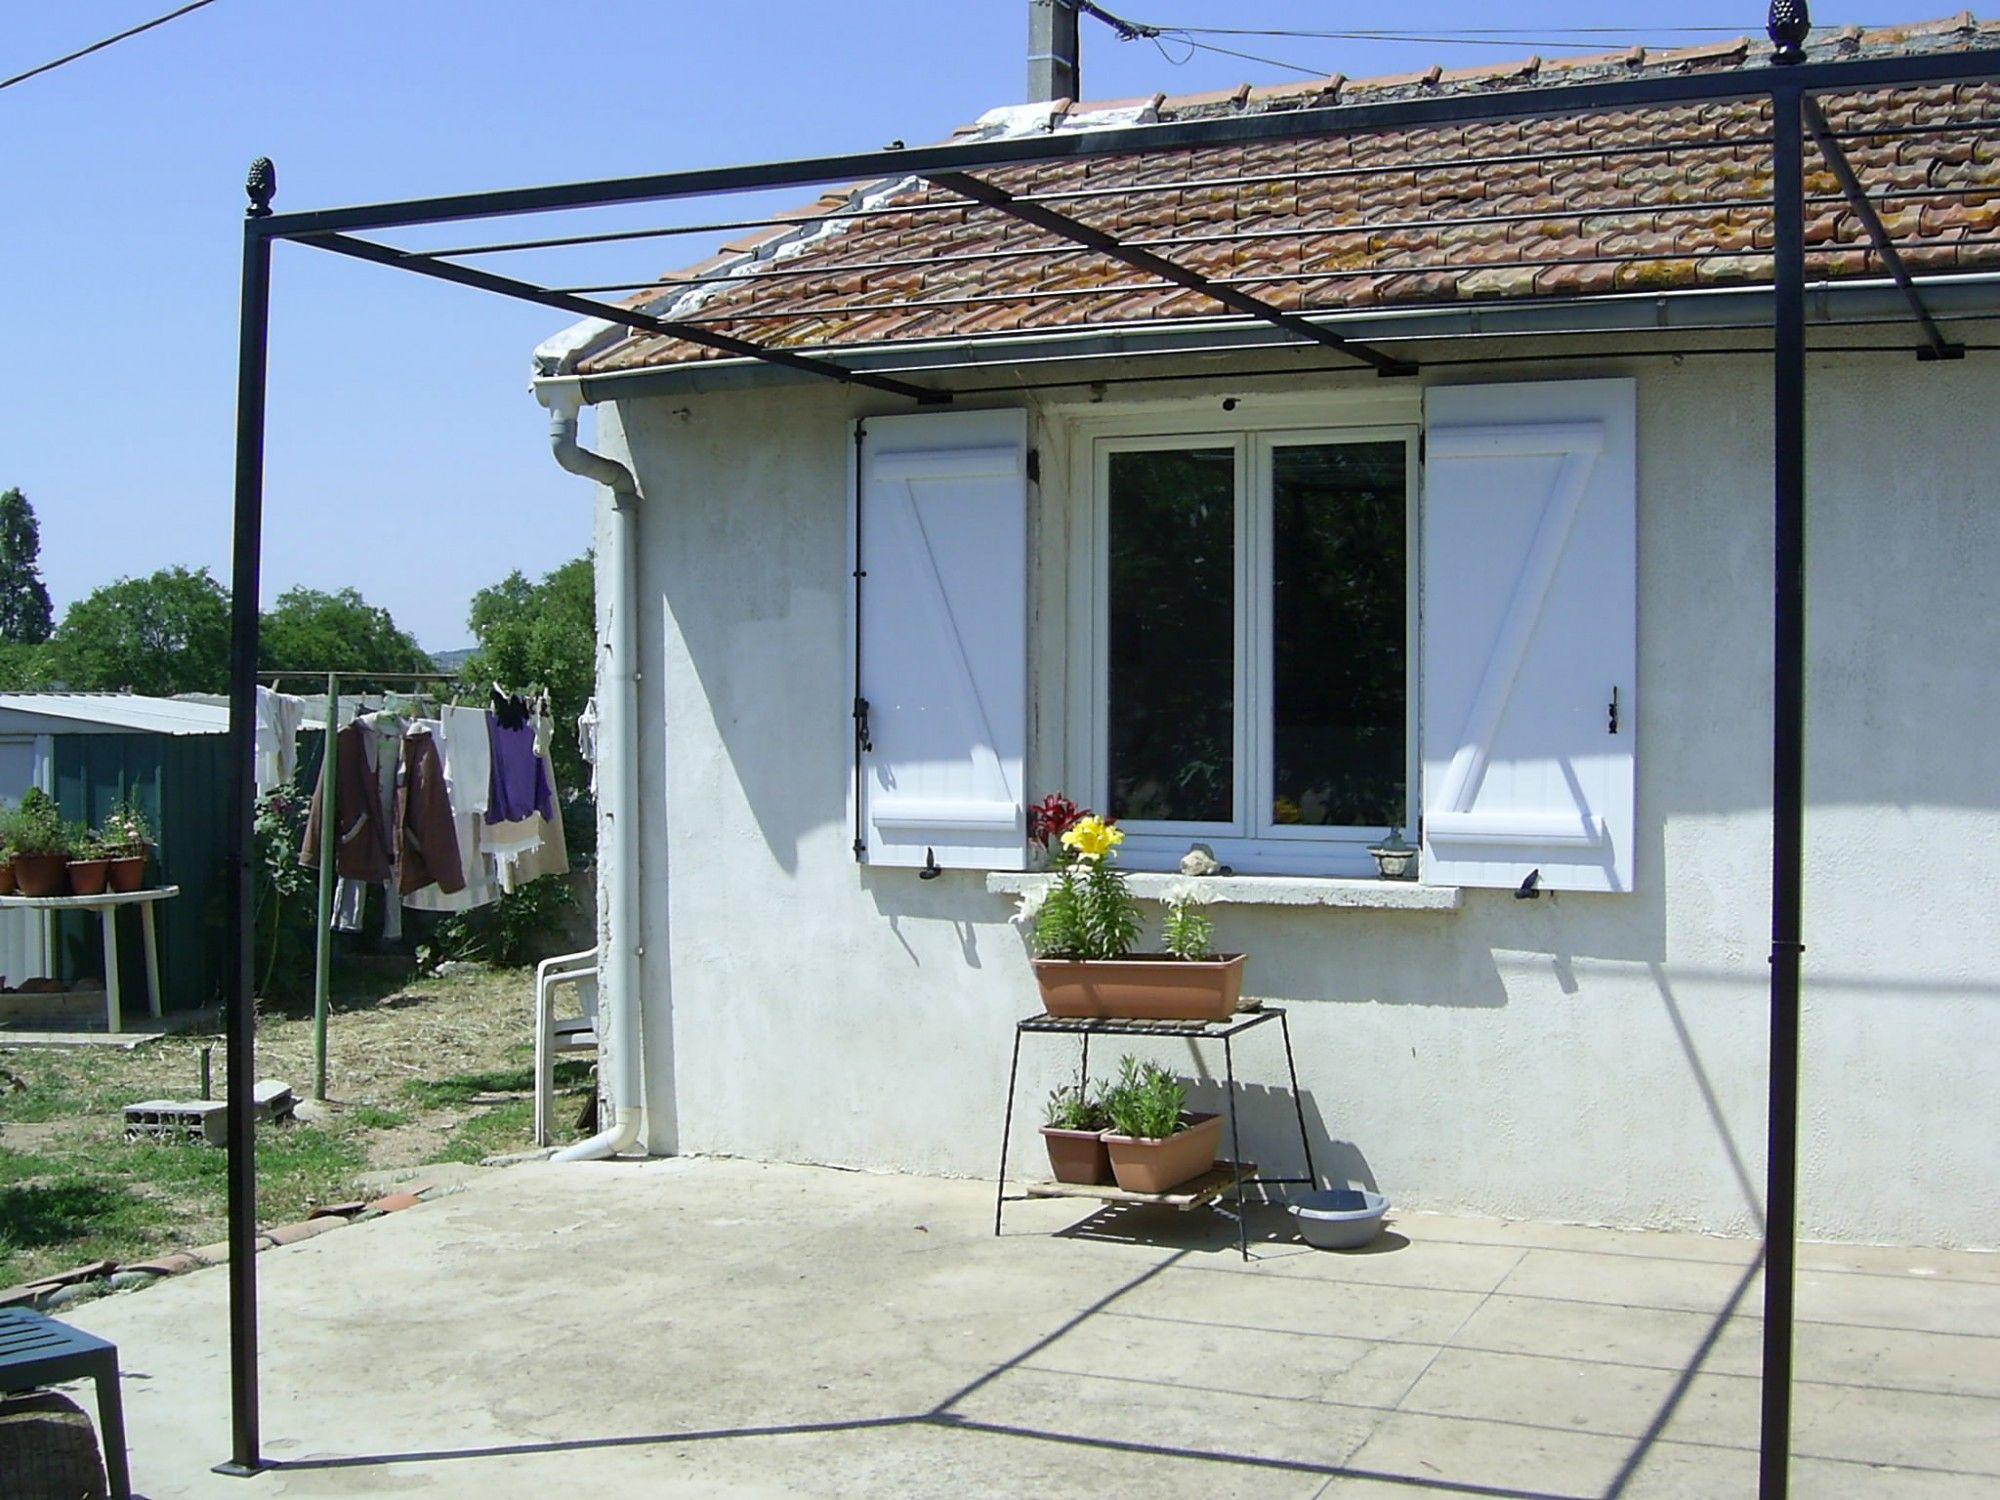 Abris de terrasse vitrolles petits budgets ferronnerie - Abri de jardin en fer ...